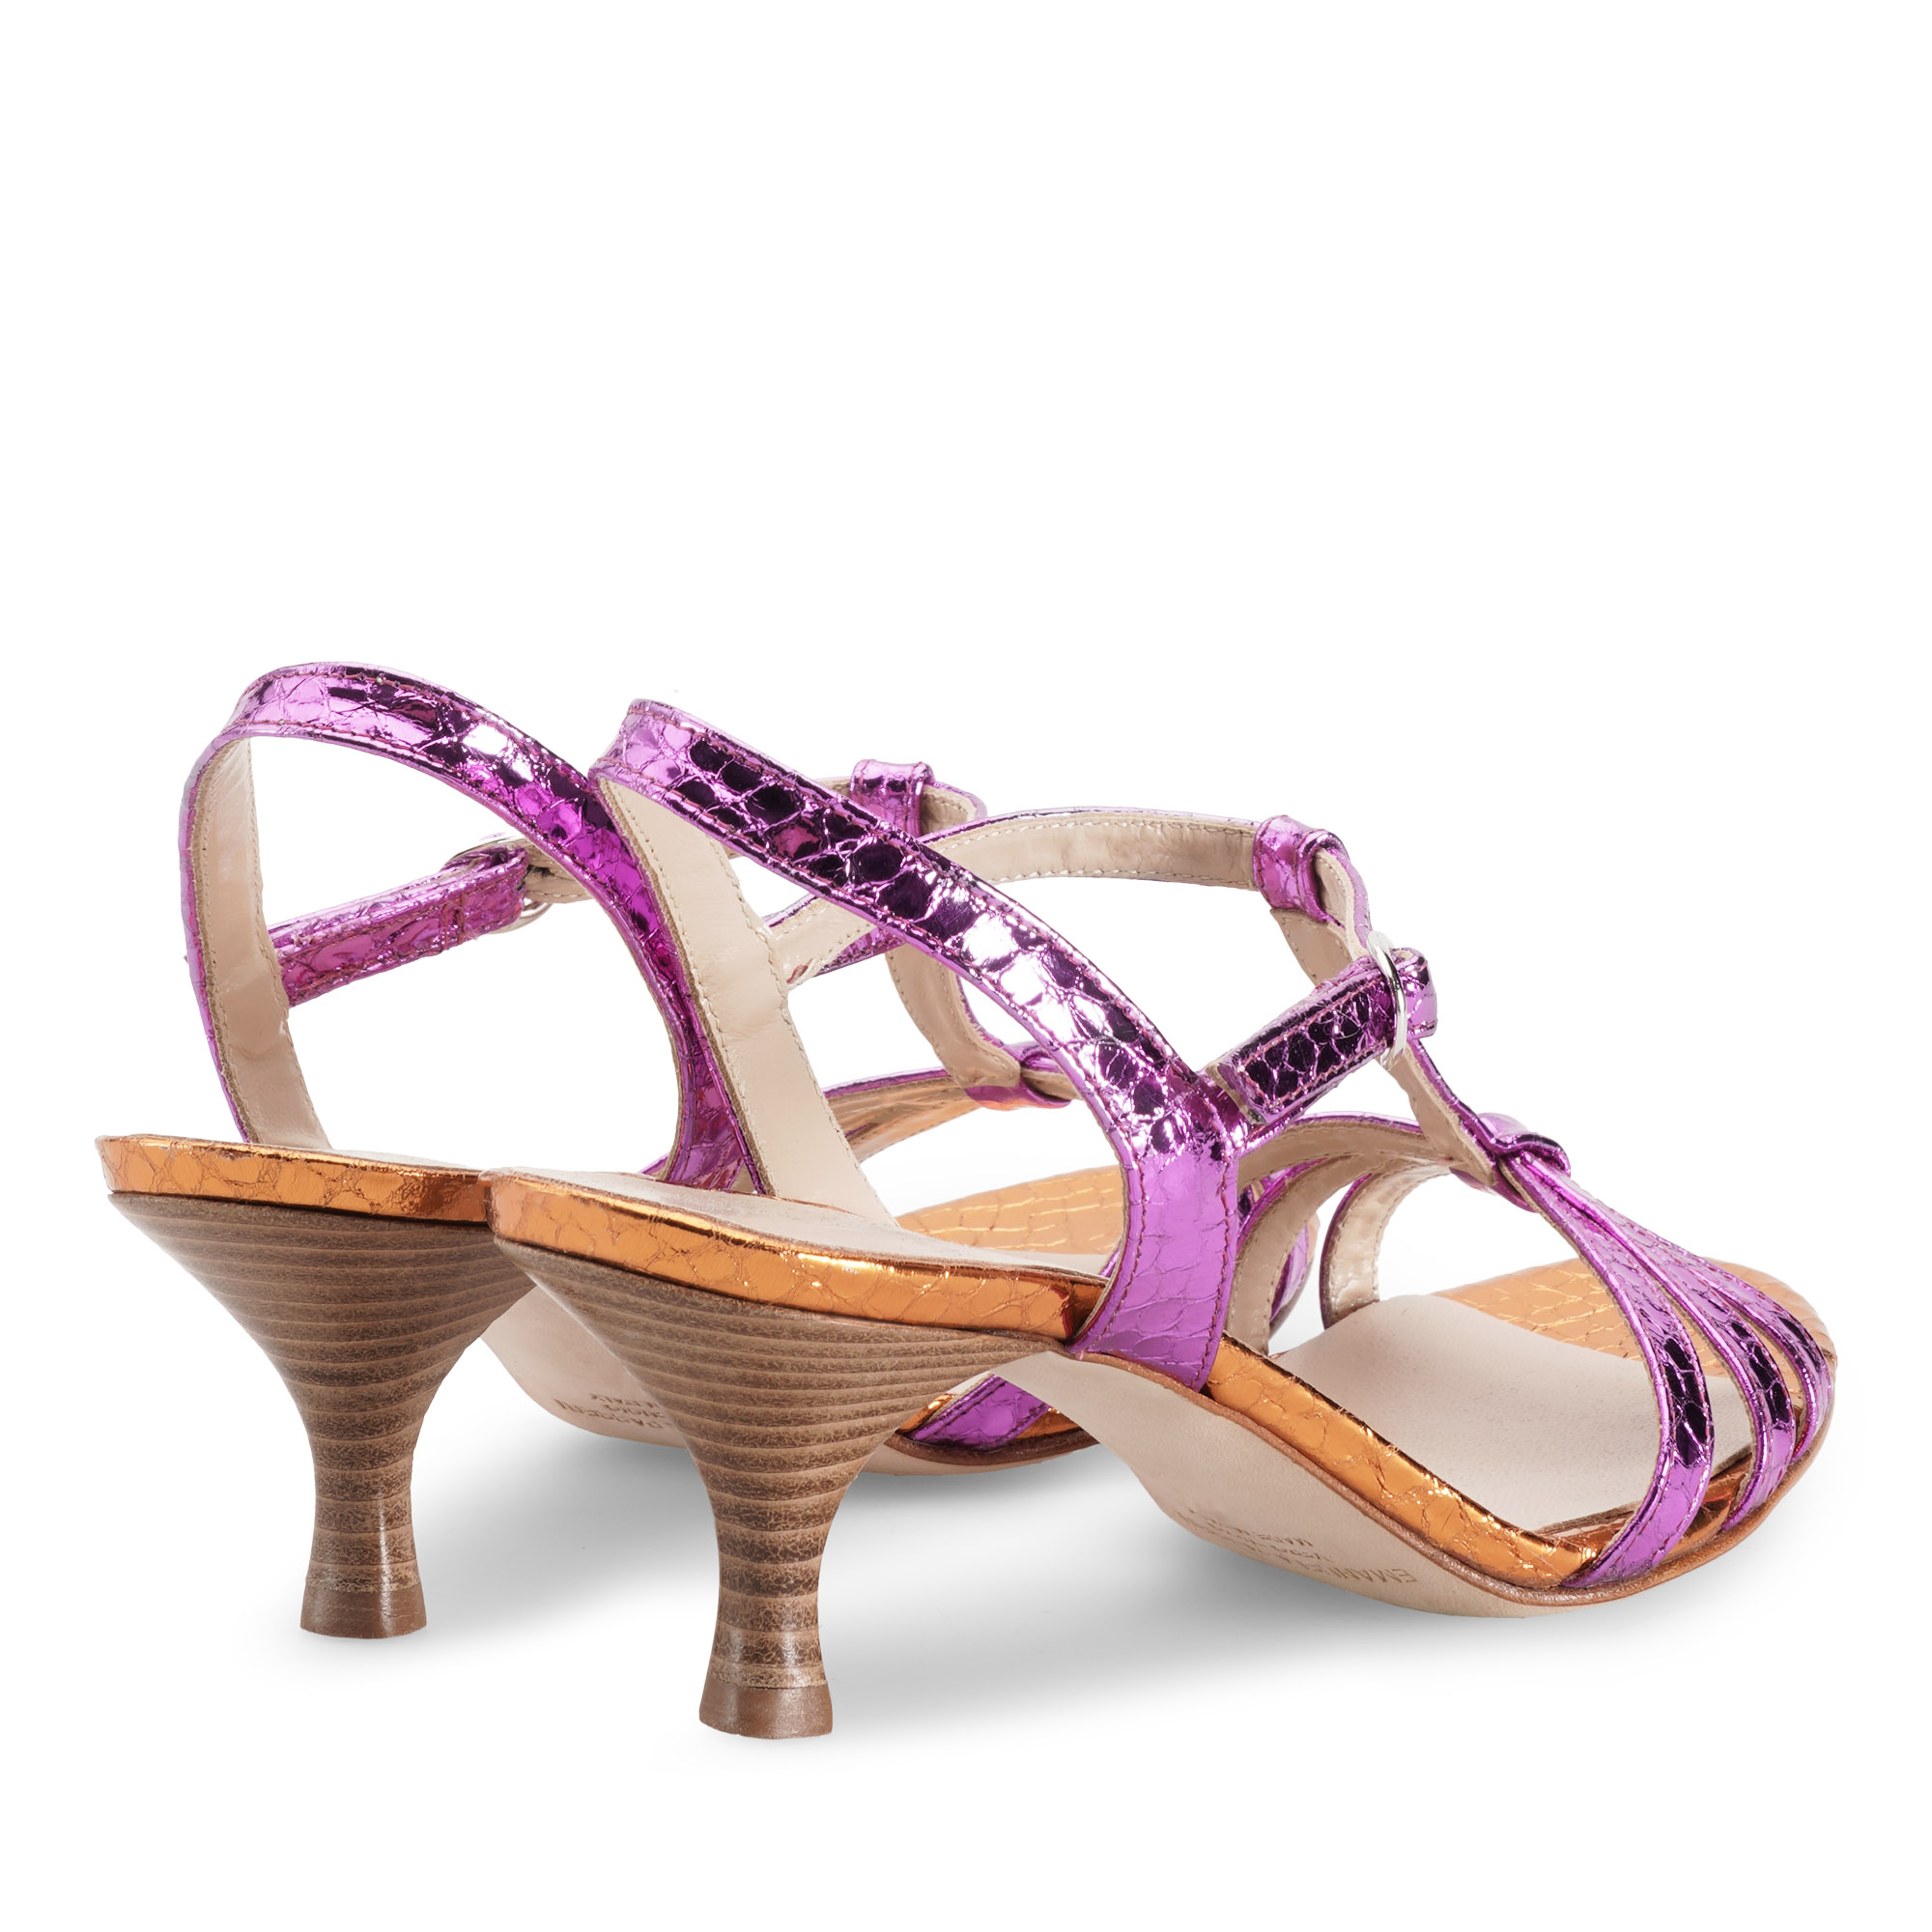 sandalo-donna-laminato-pitone-fuxia-arancione-emanuela-passeri-shoes-heels-spring-summer-2021